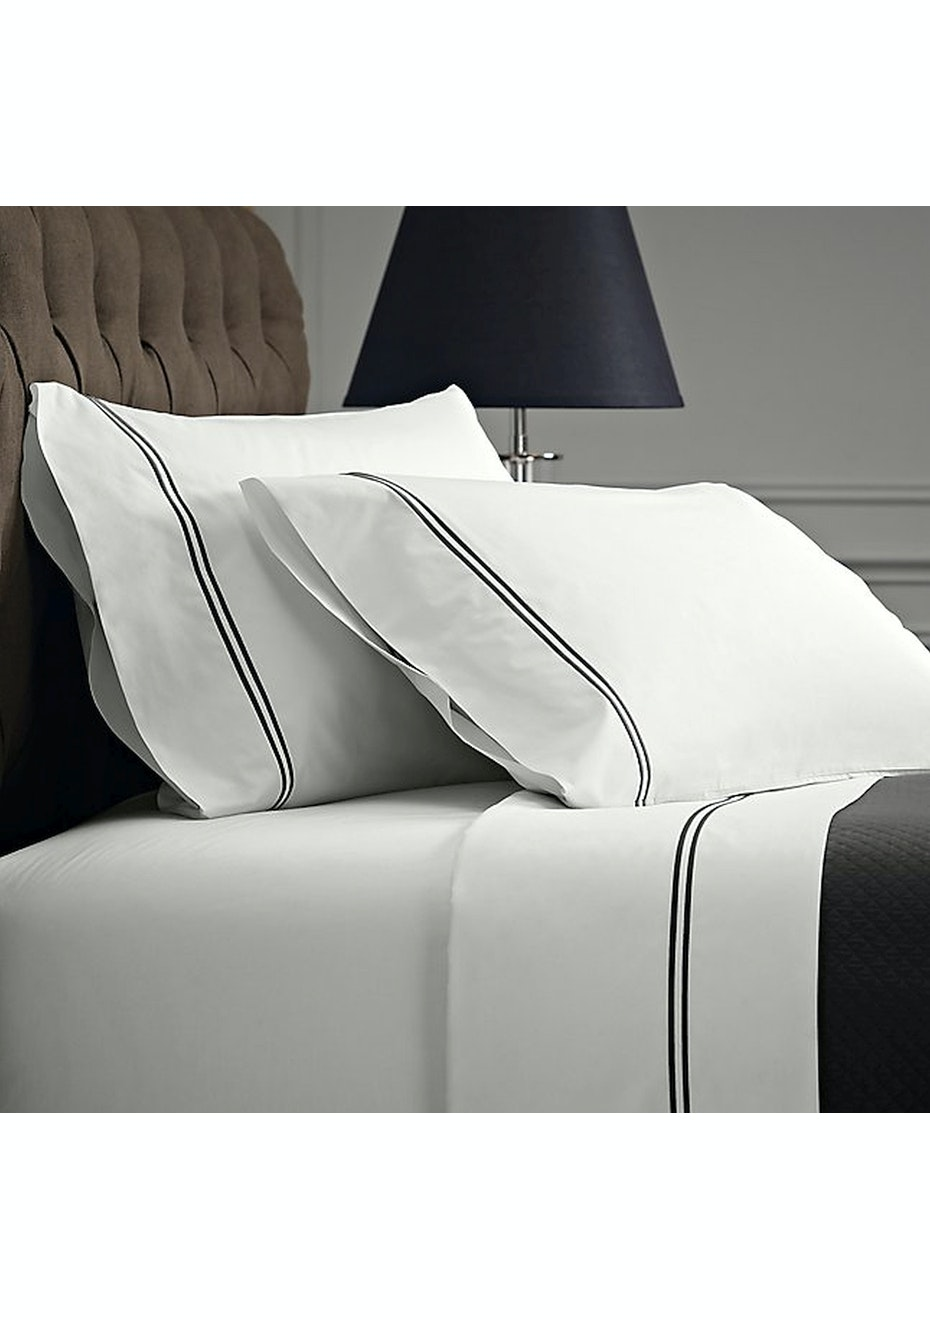 Style & Co 1000 Thread count Egyptian Cotton Hotel Collection Sorrento Sheet sets Mega Queen White